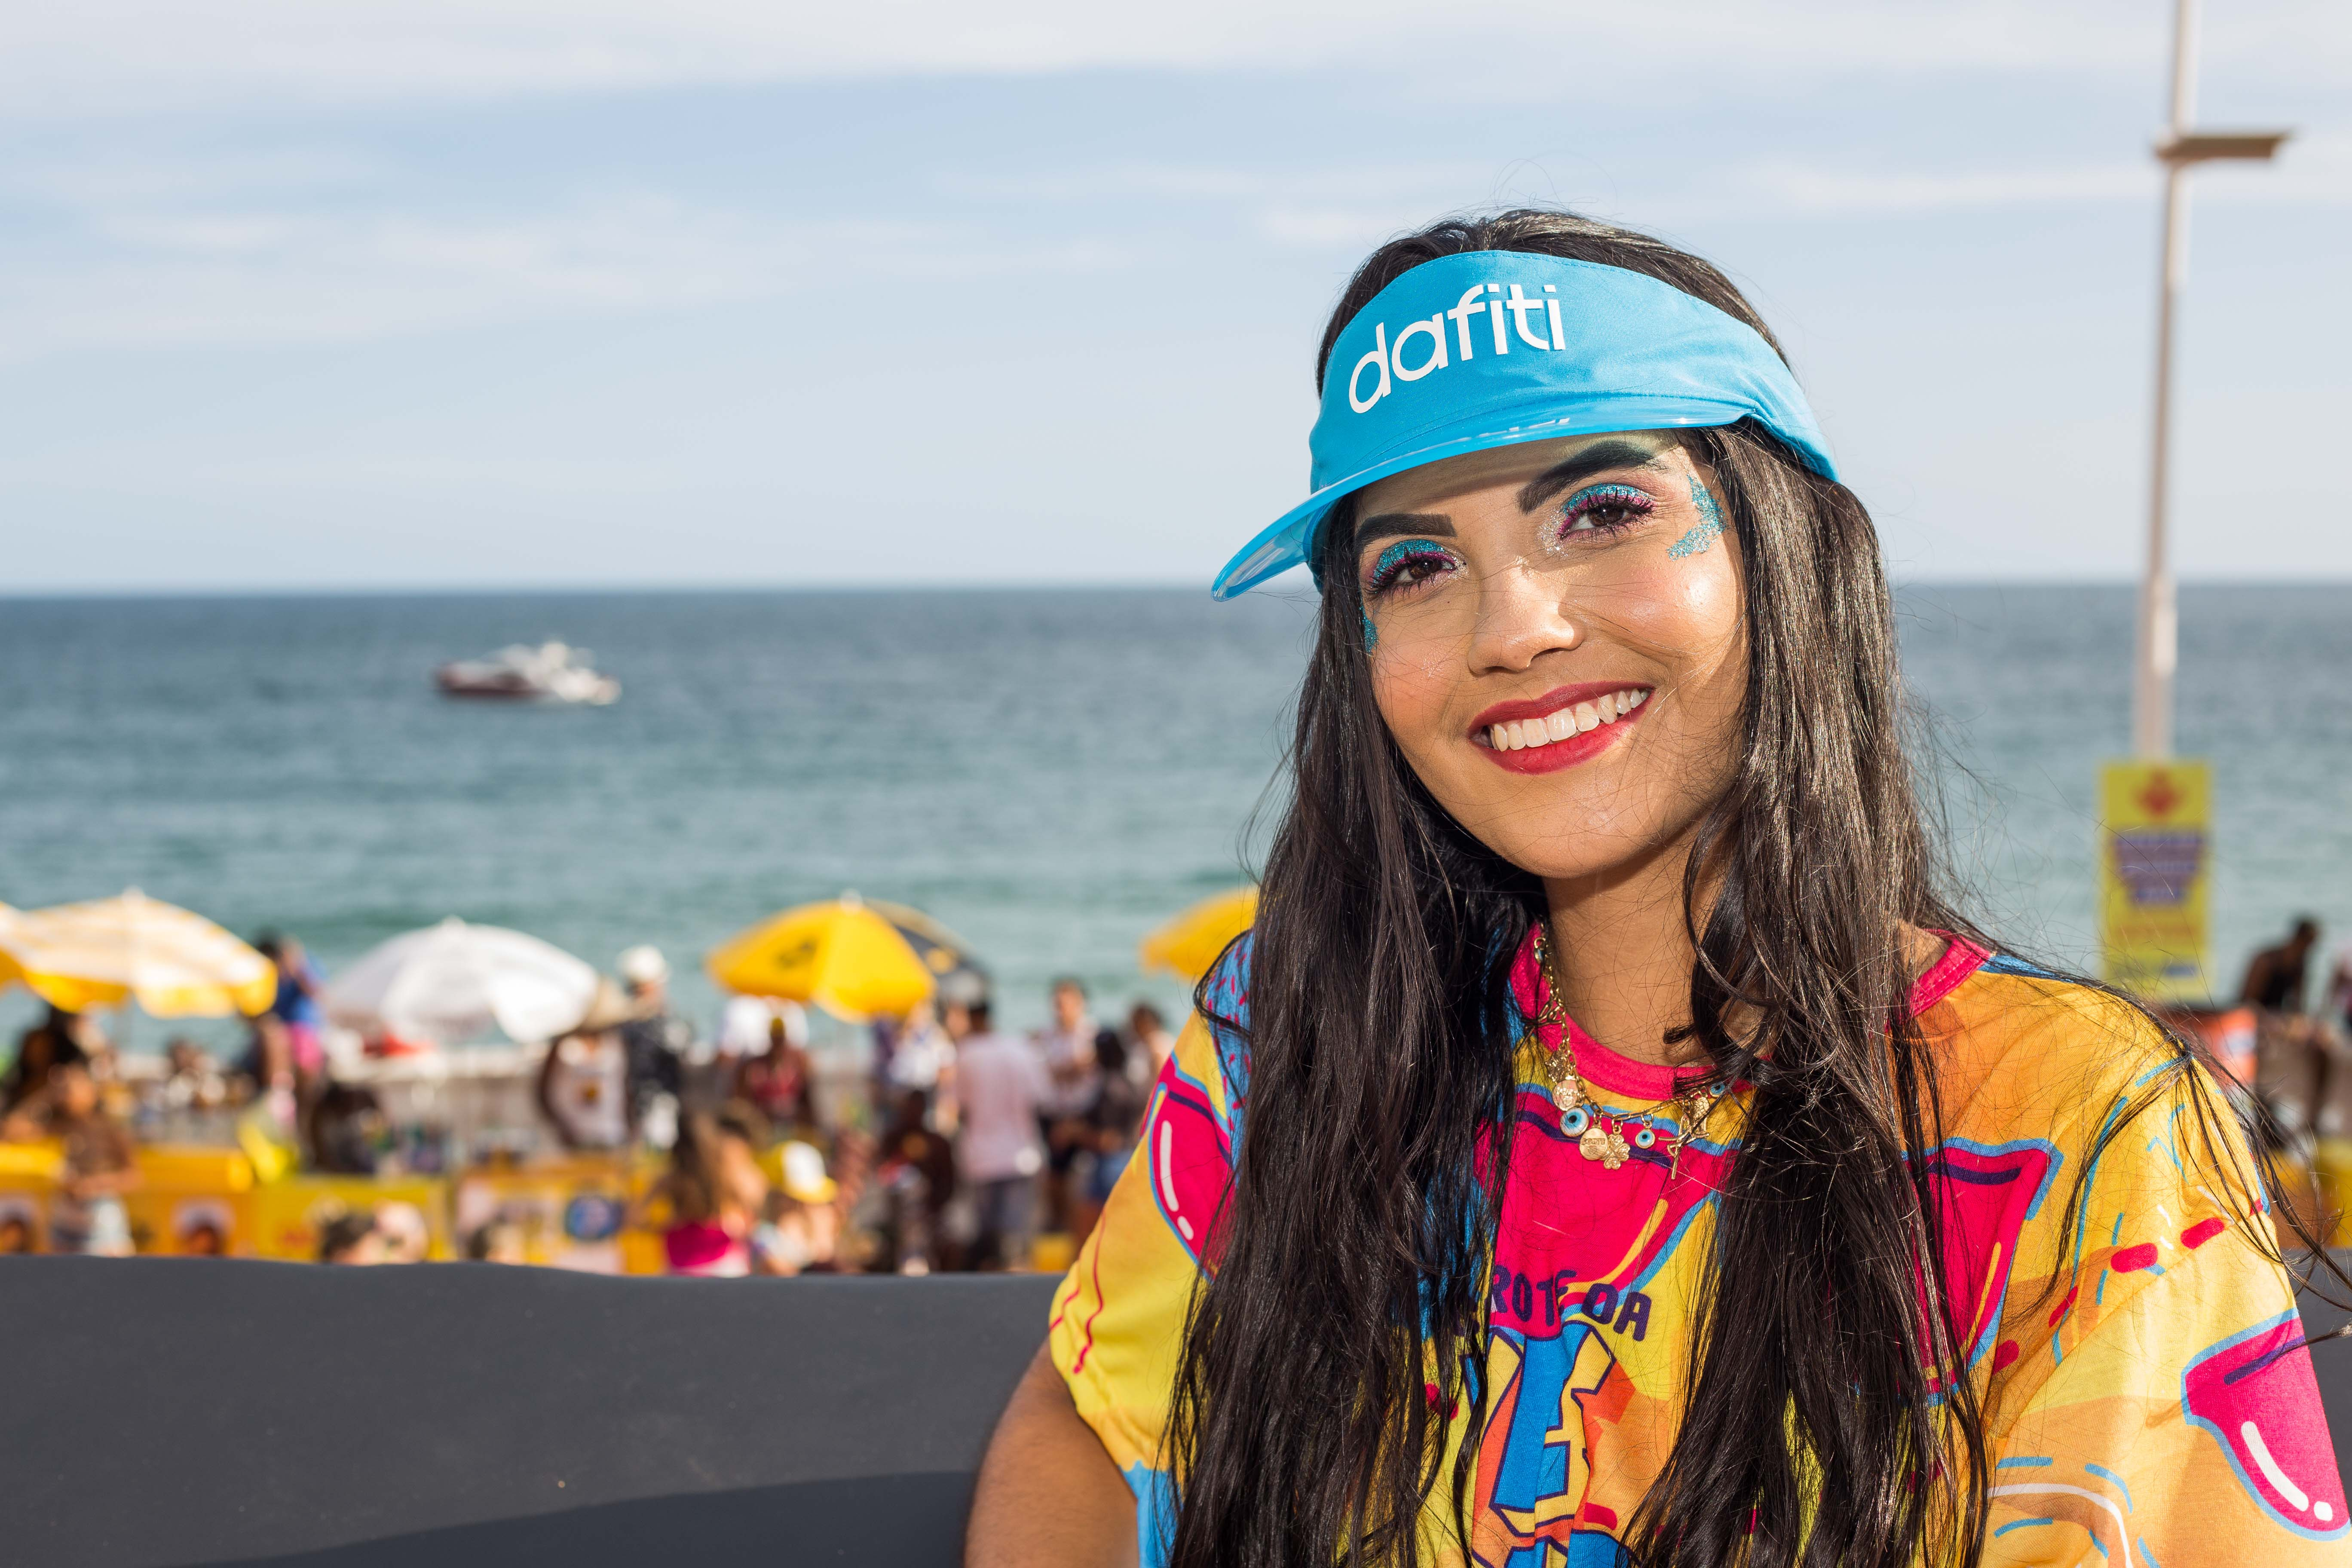 Larissa Machado